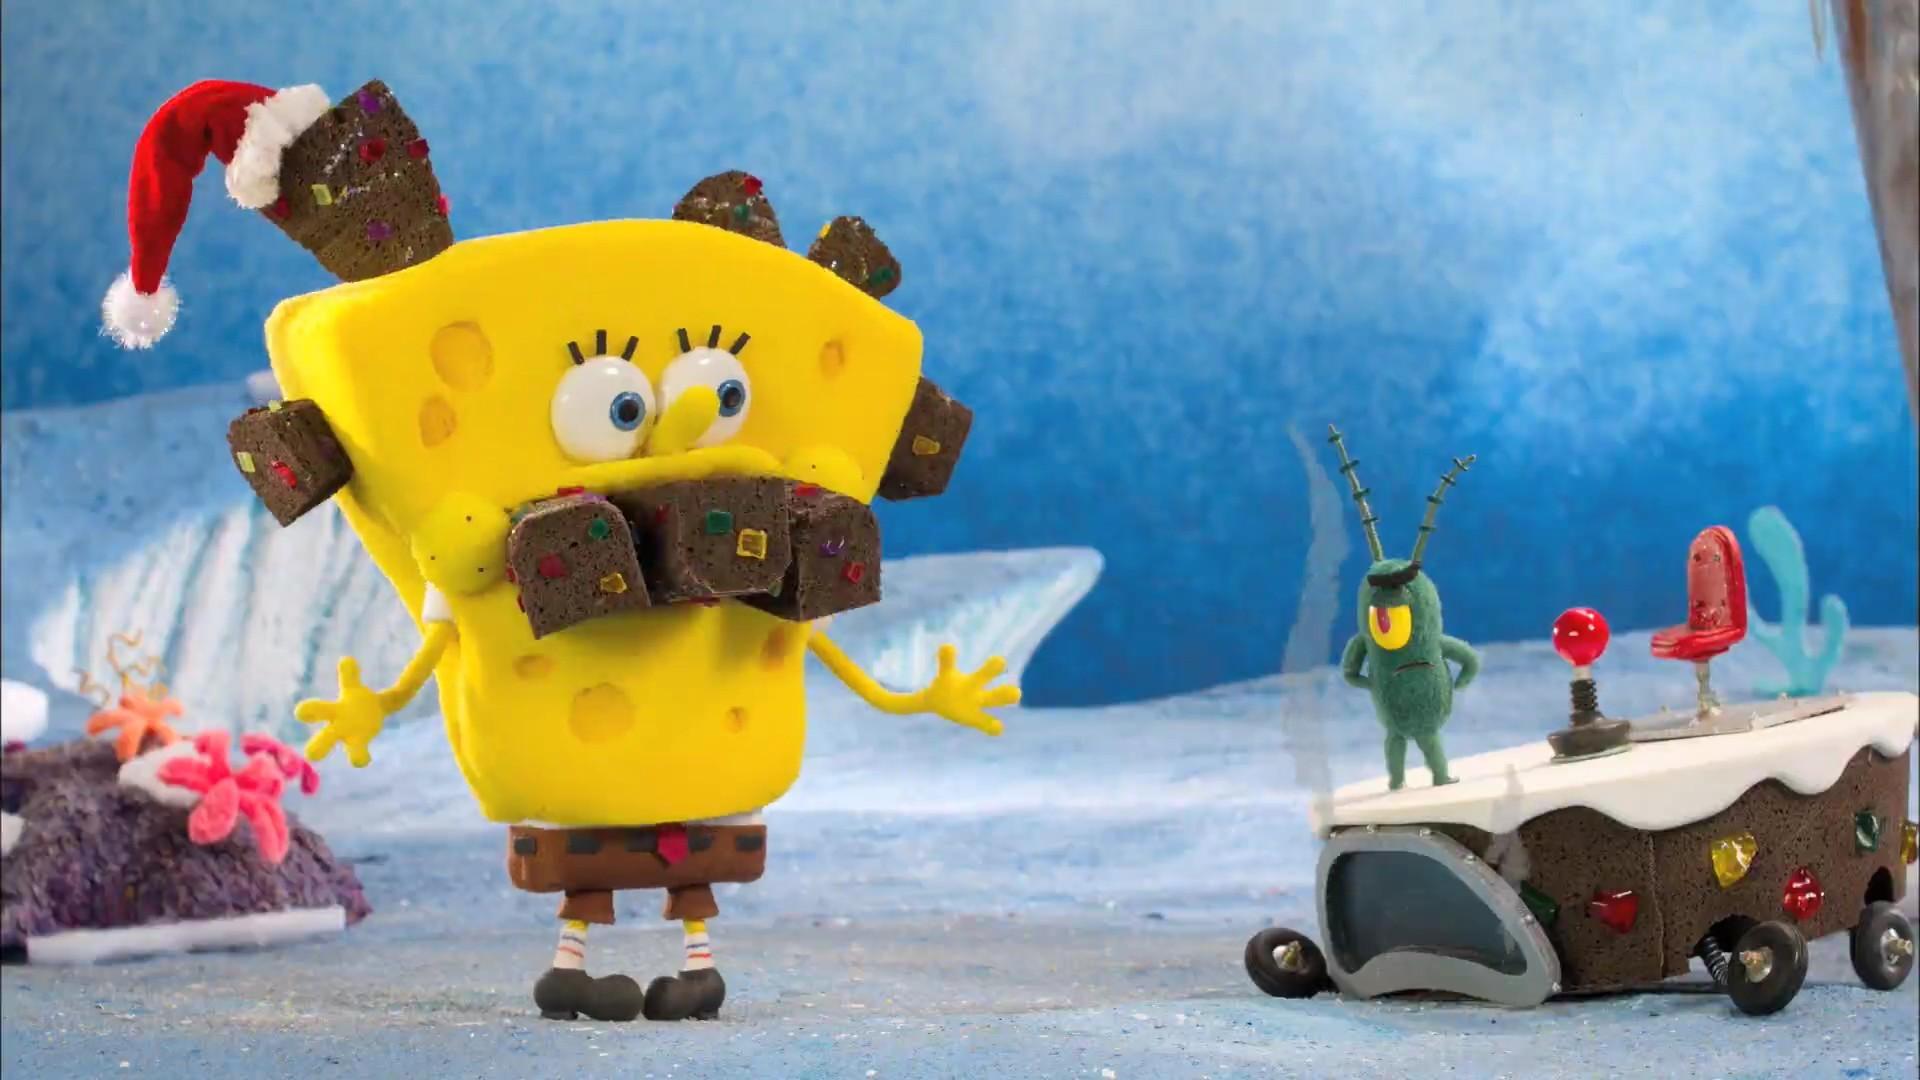 Res: 1920x1080, Spongebob Squarepants funny humor christmas f wallpaper |  | 98265  | WallpaperUP